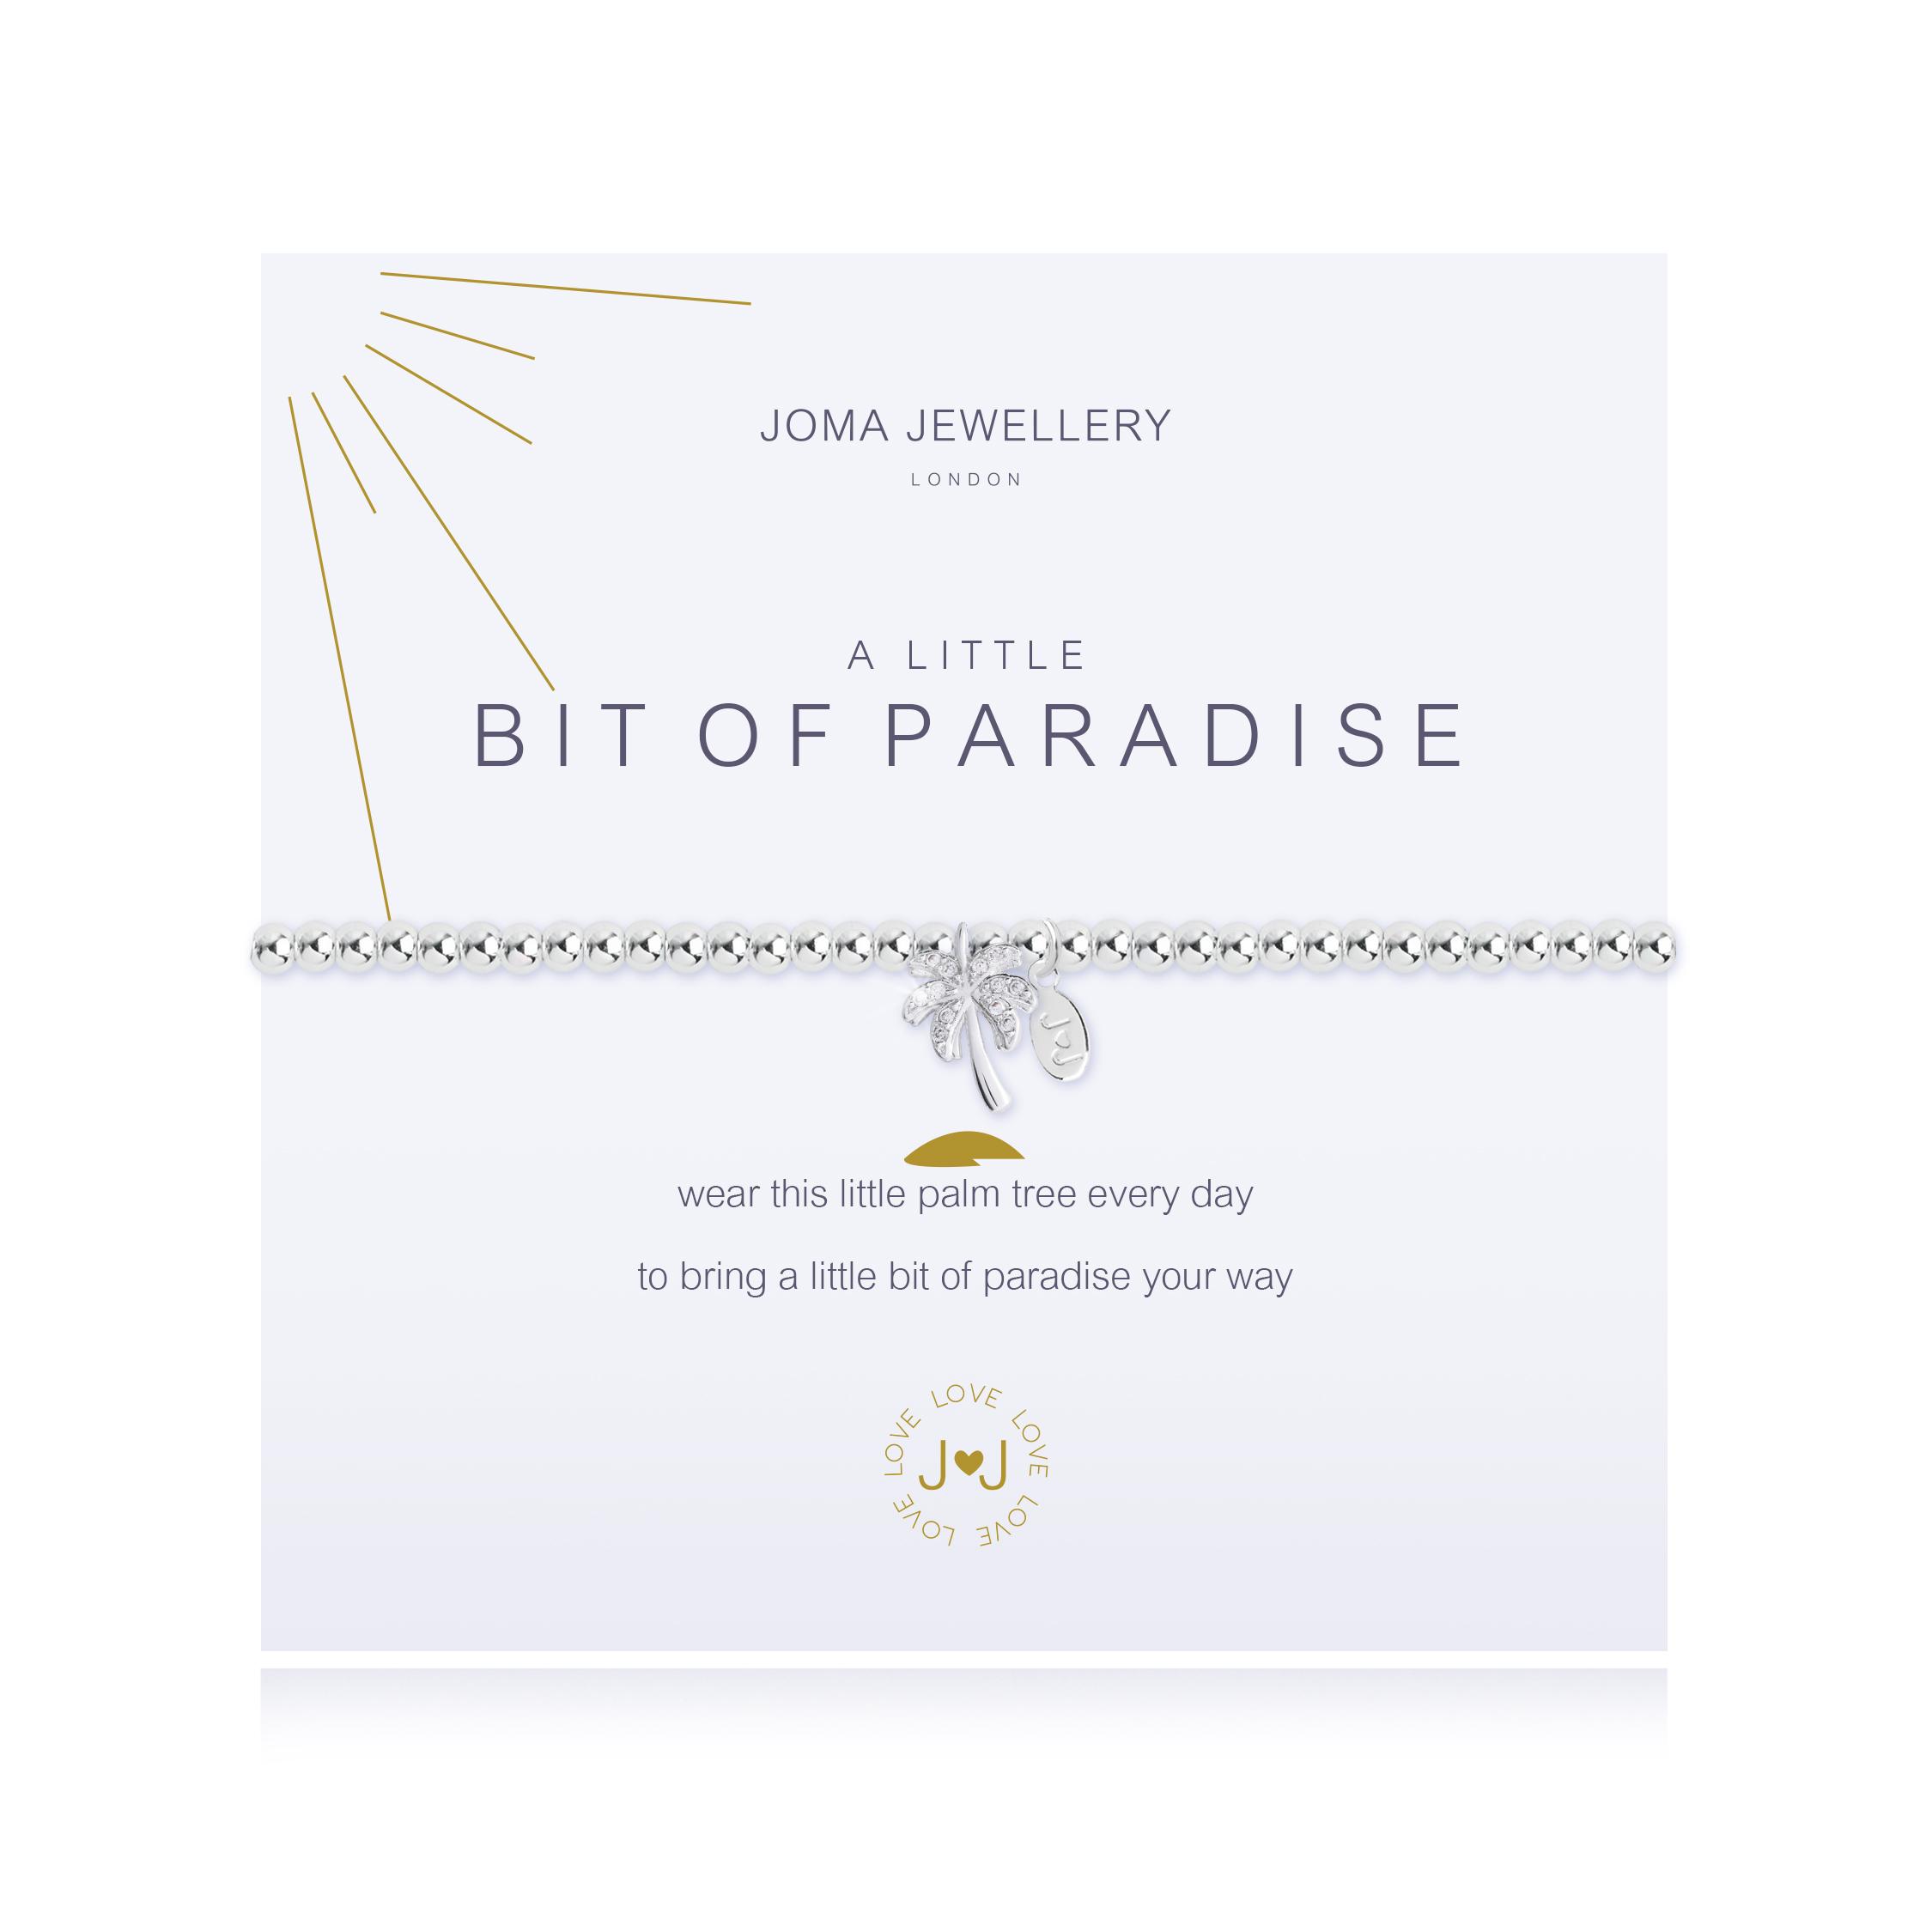 3e18316f27b07 A Little Bit of Paradise Bracelet by Joma Jewellery